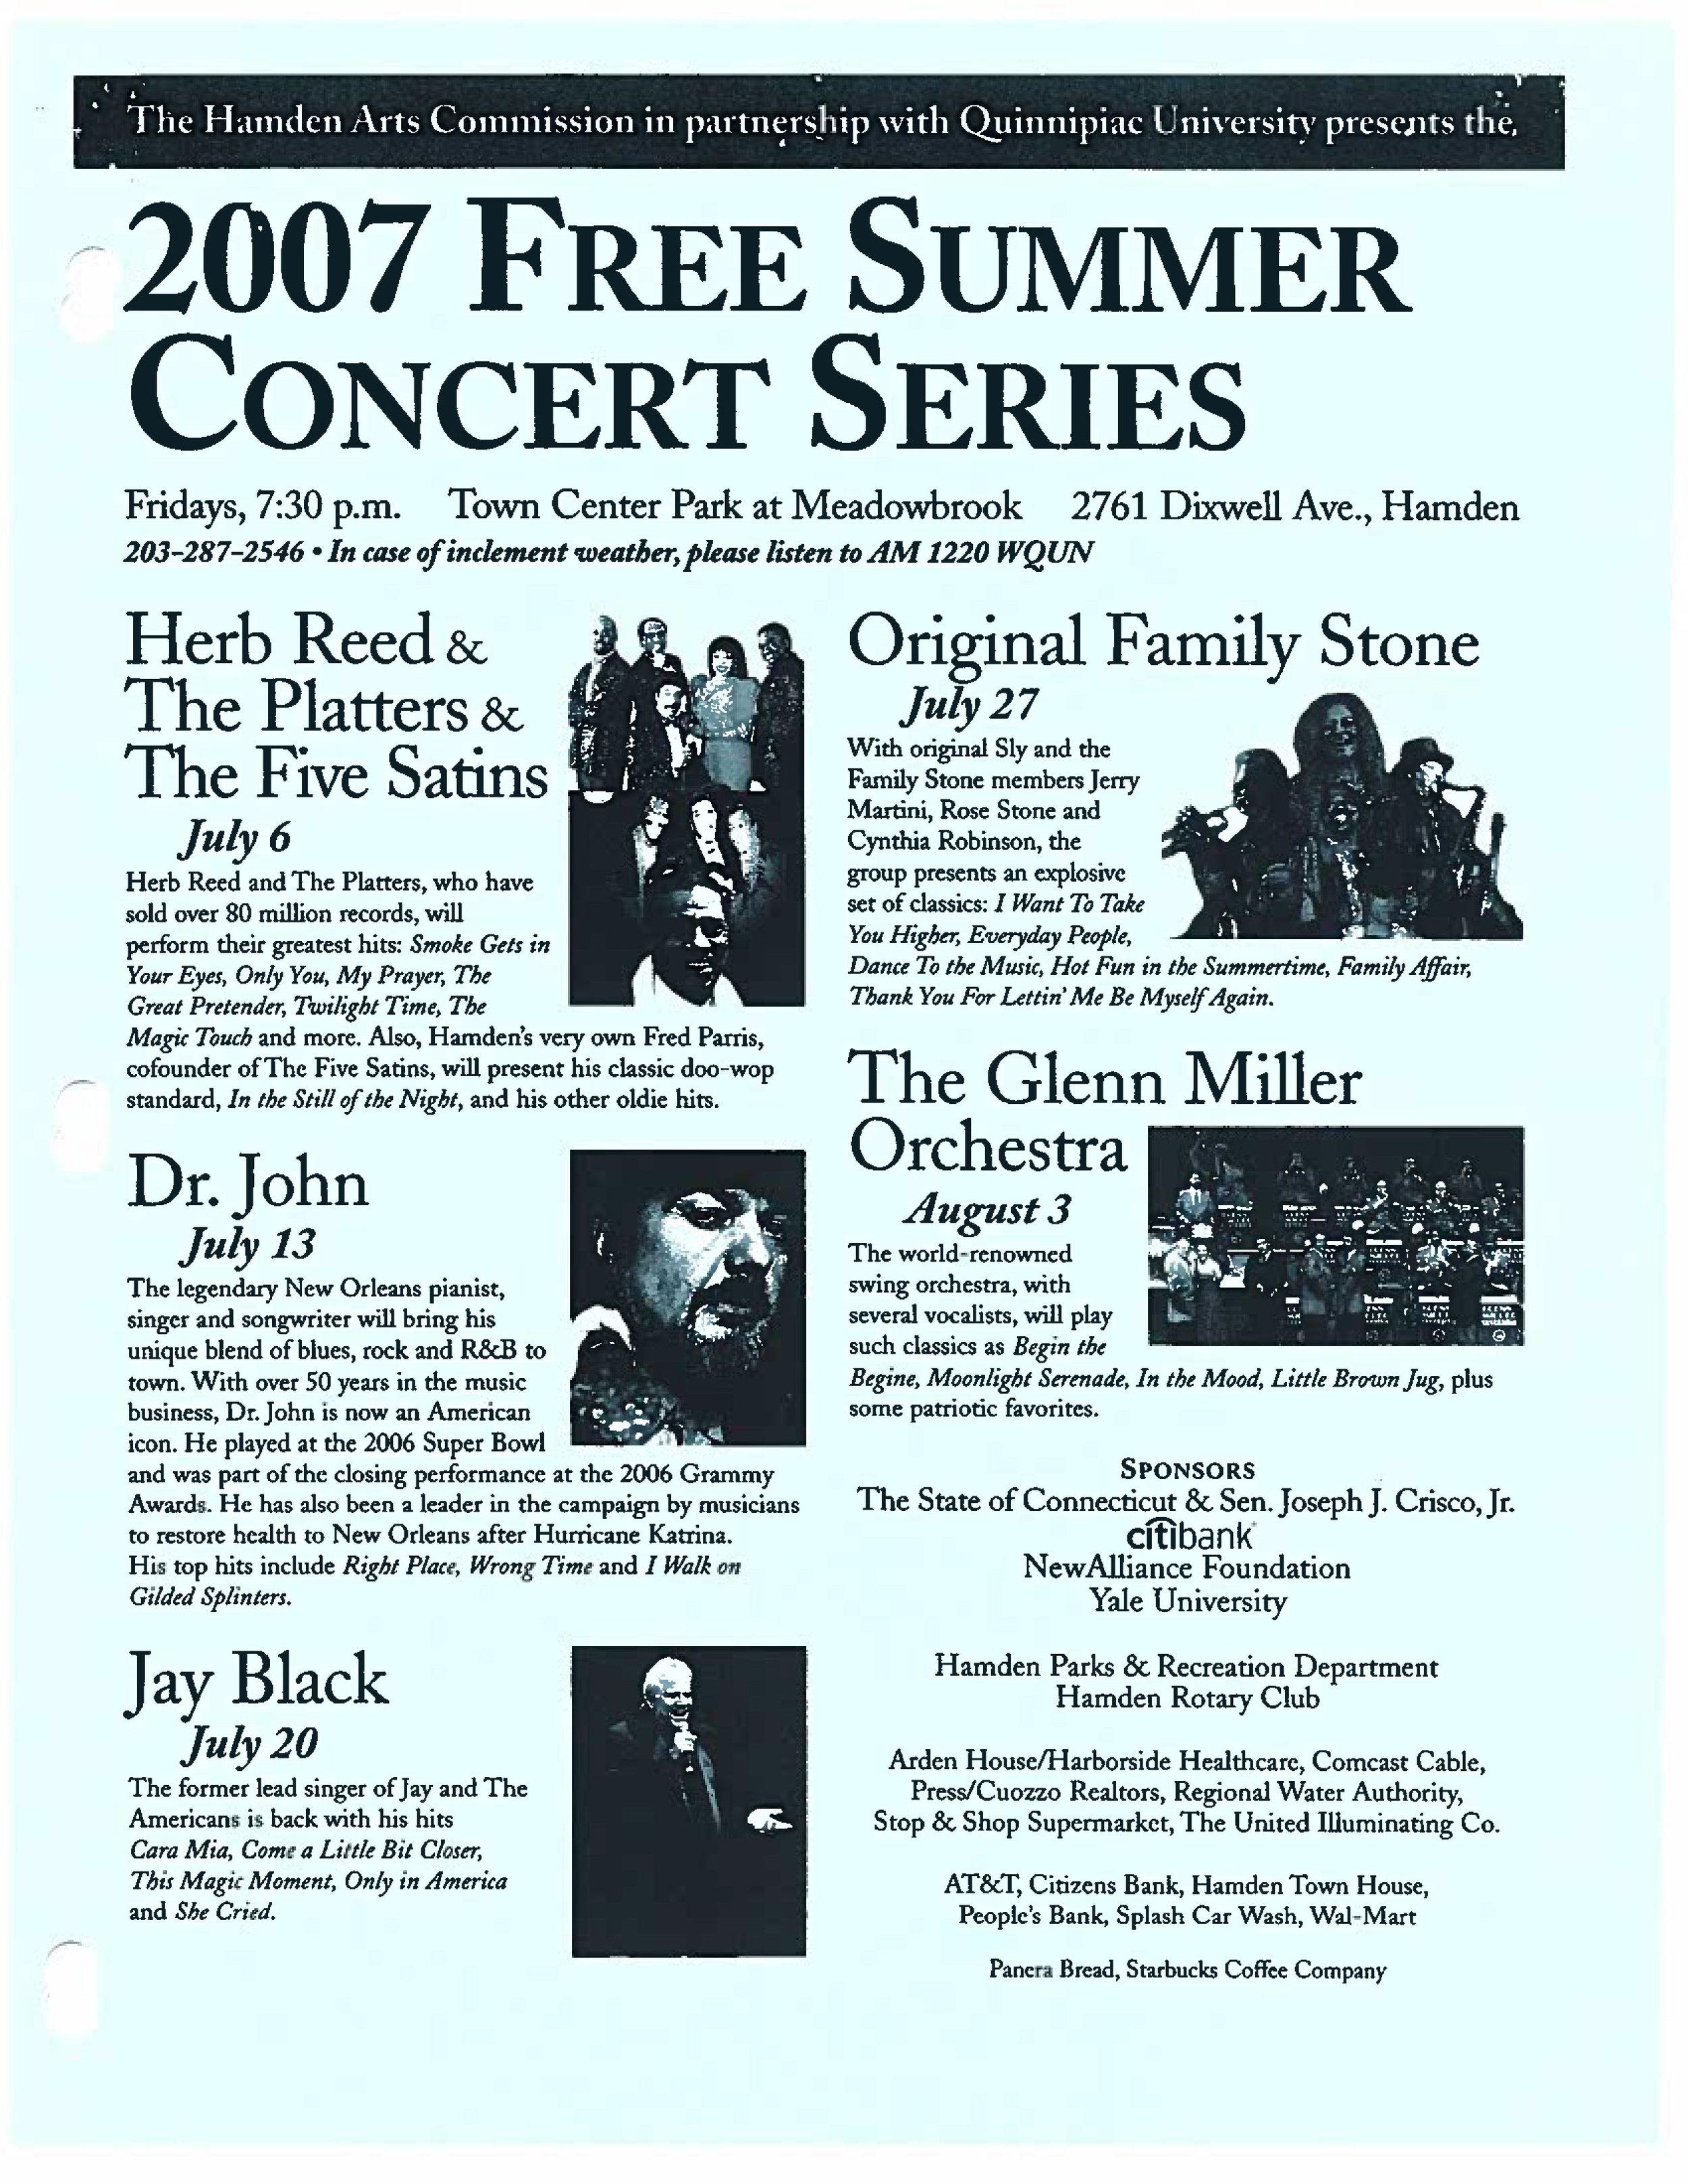 2007_Concerts Program.jpg